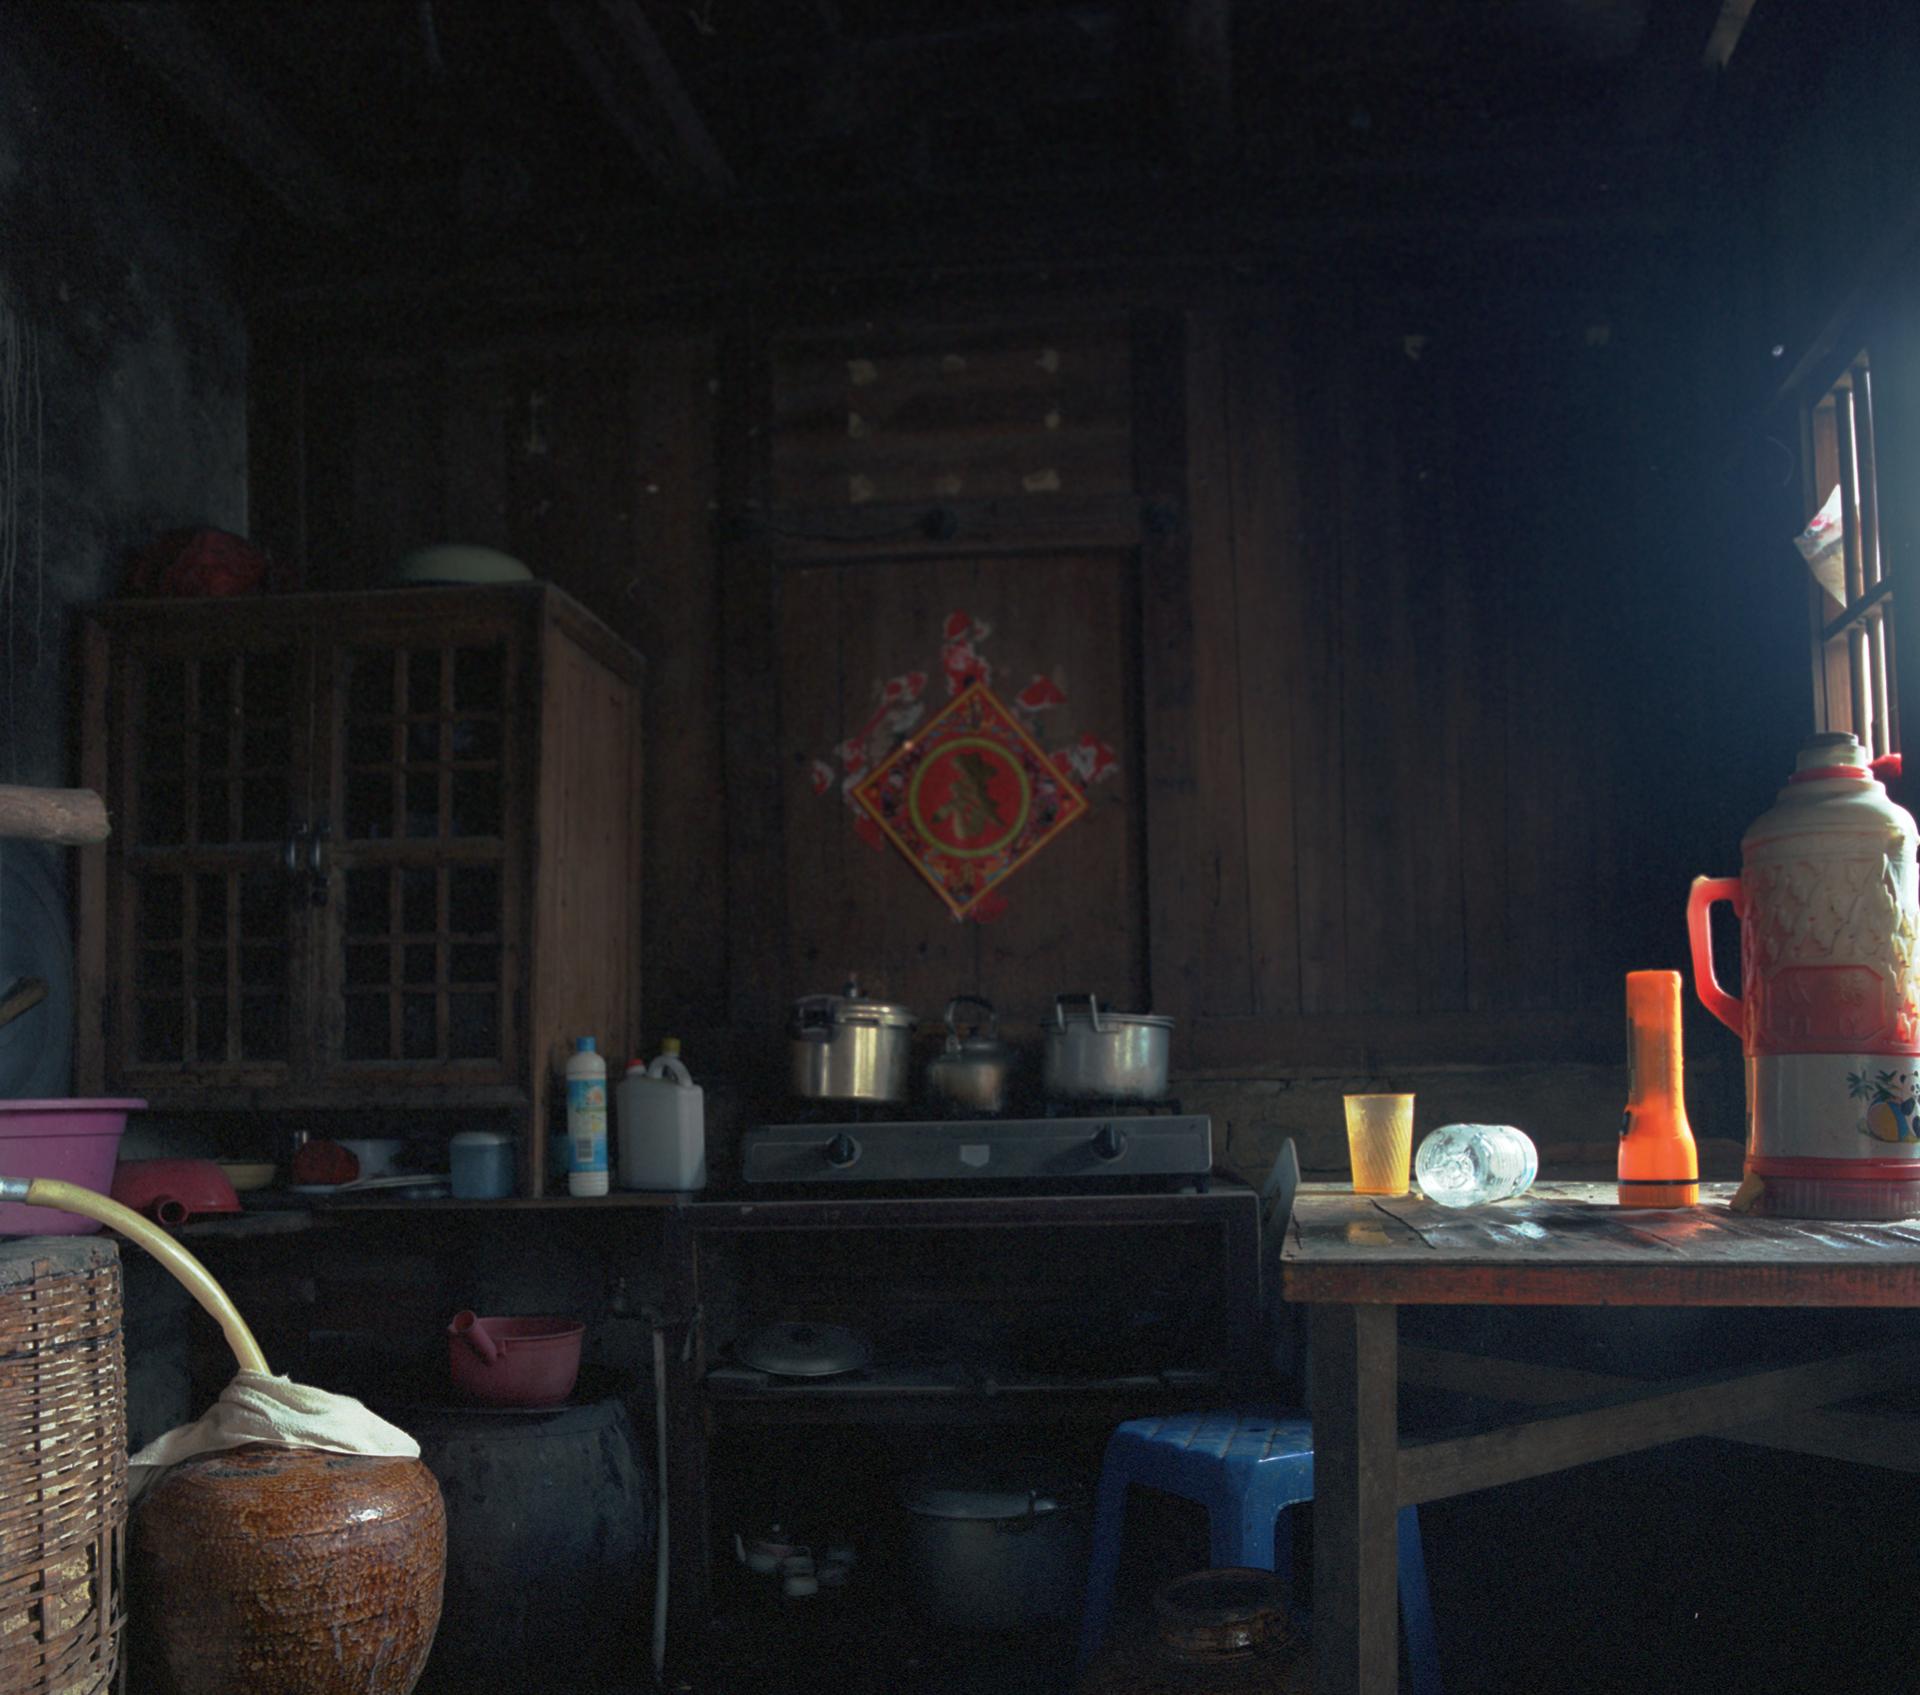 2009 Fujian - home distillery in the Hakka house. The stuff tastes awful.